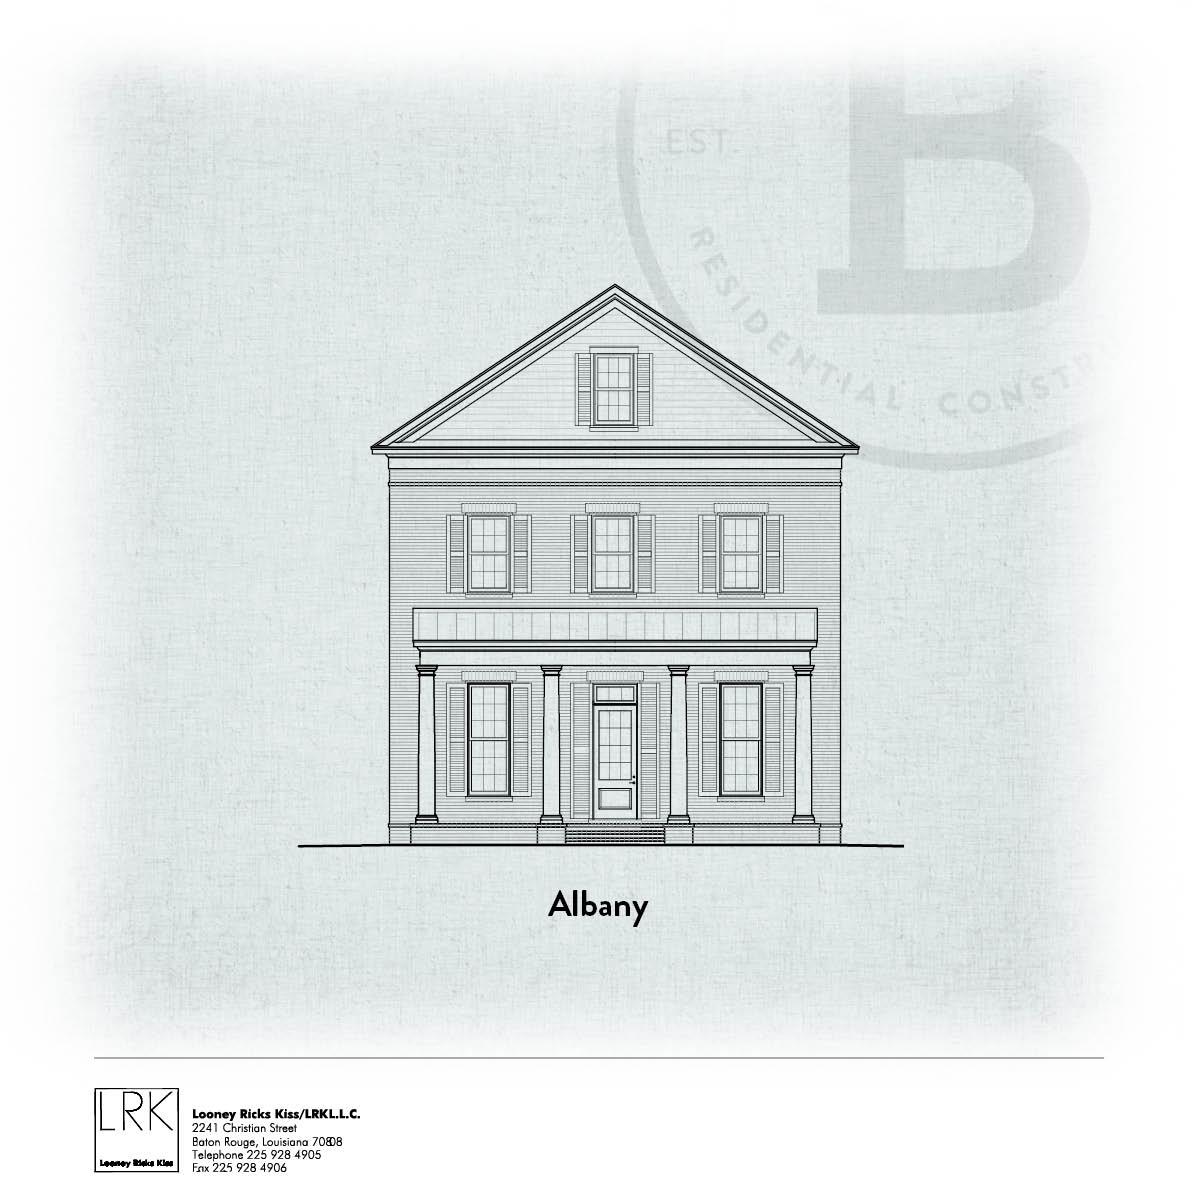 Albany Elevation